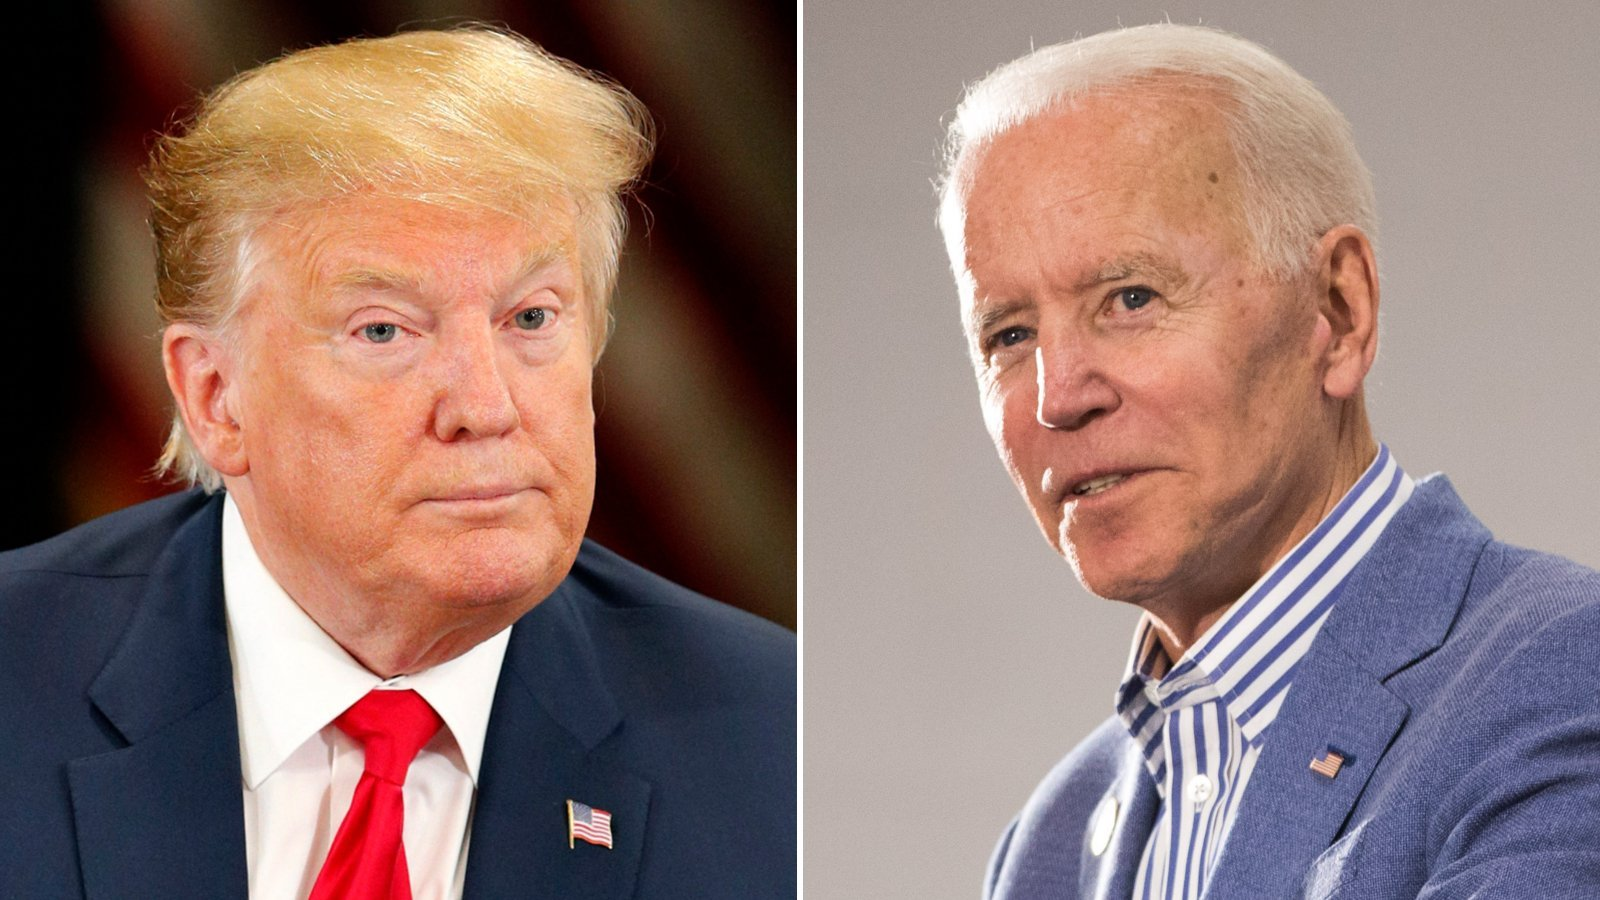 Trump's focus on Biden also highlights his own questionable business arrangements